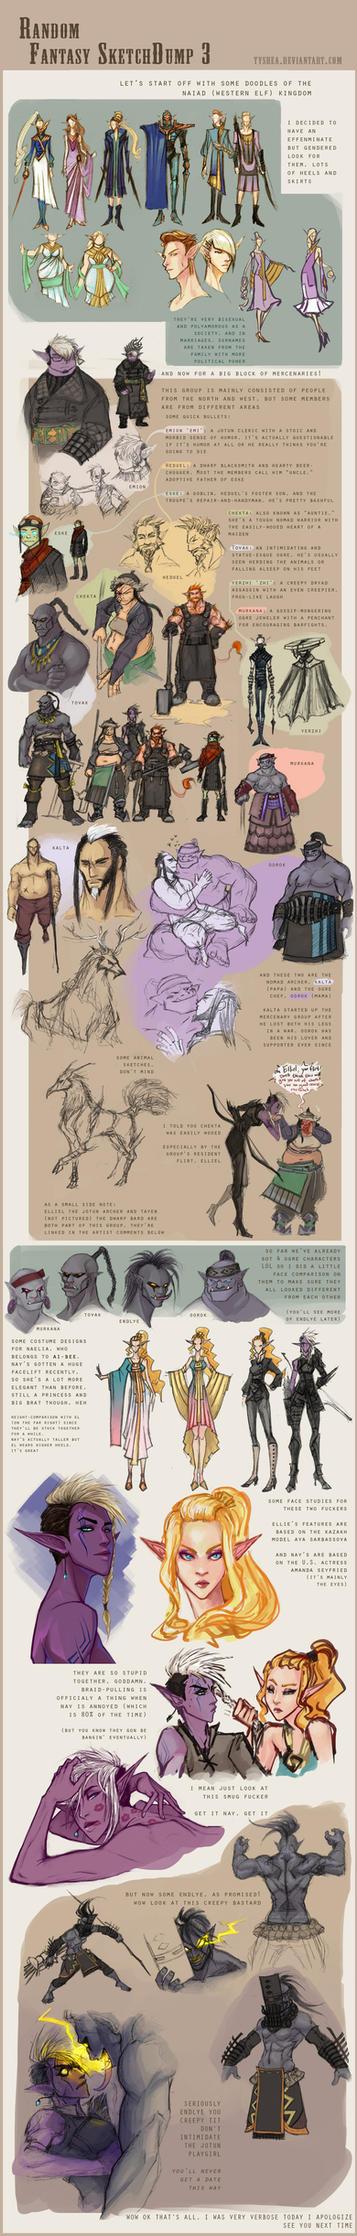 Fantasy Sketchdump 3 by Tyshea